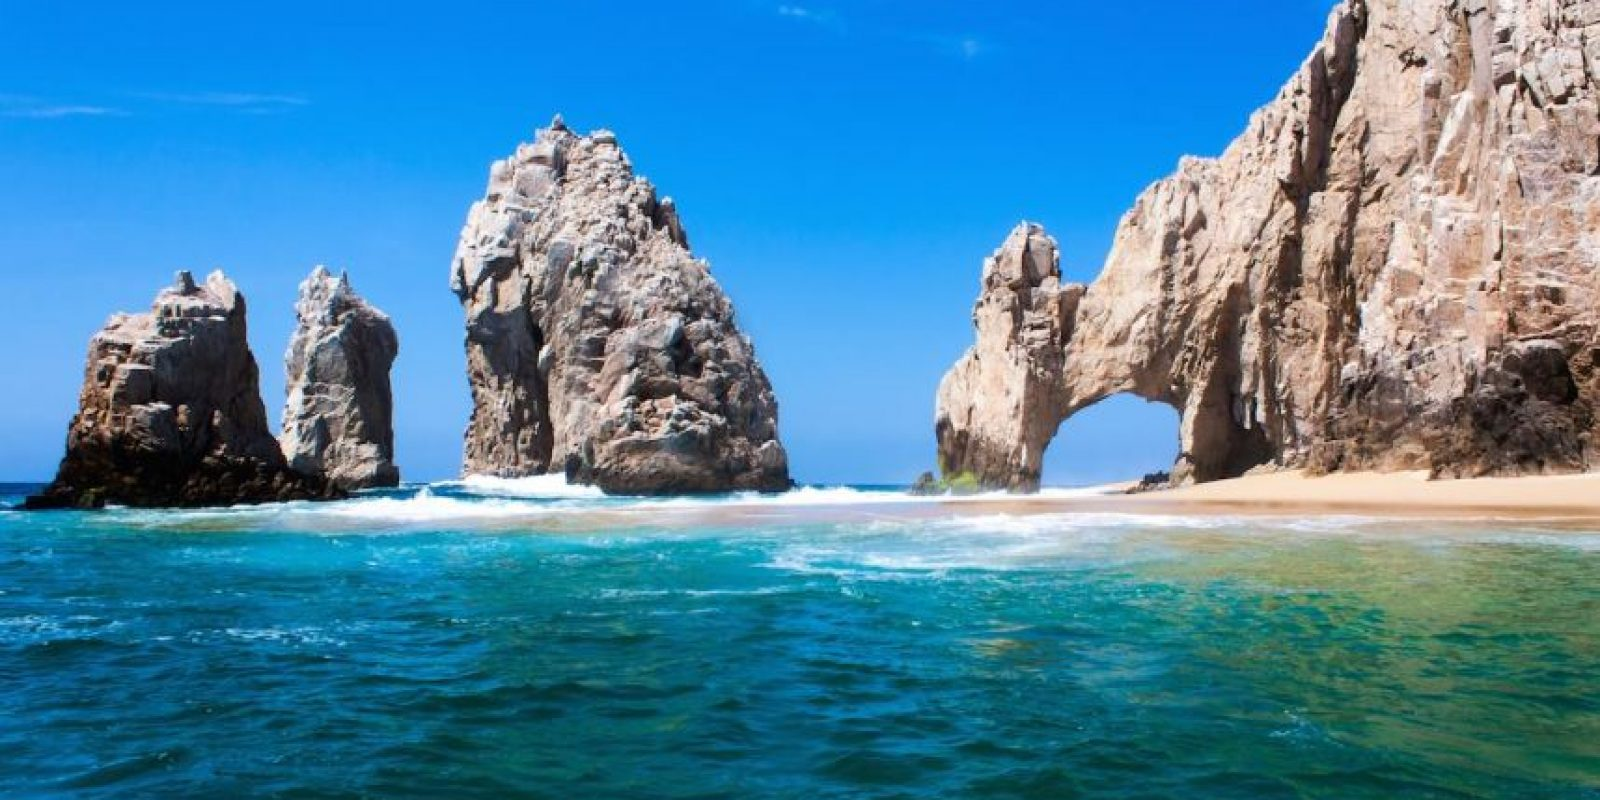 Cabo San Lucas Foto:Dreamstime